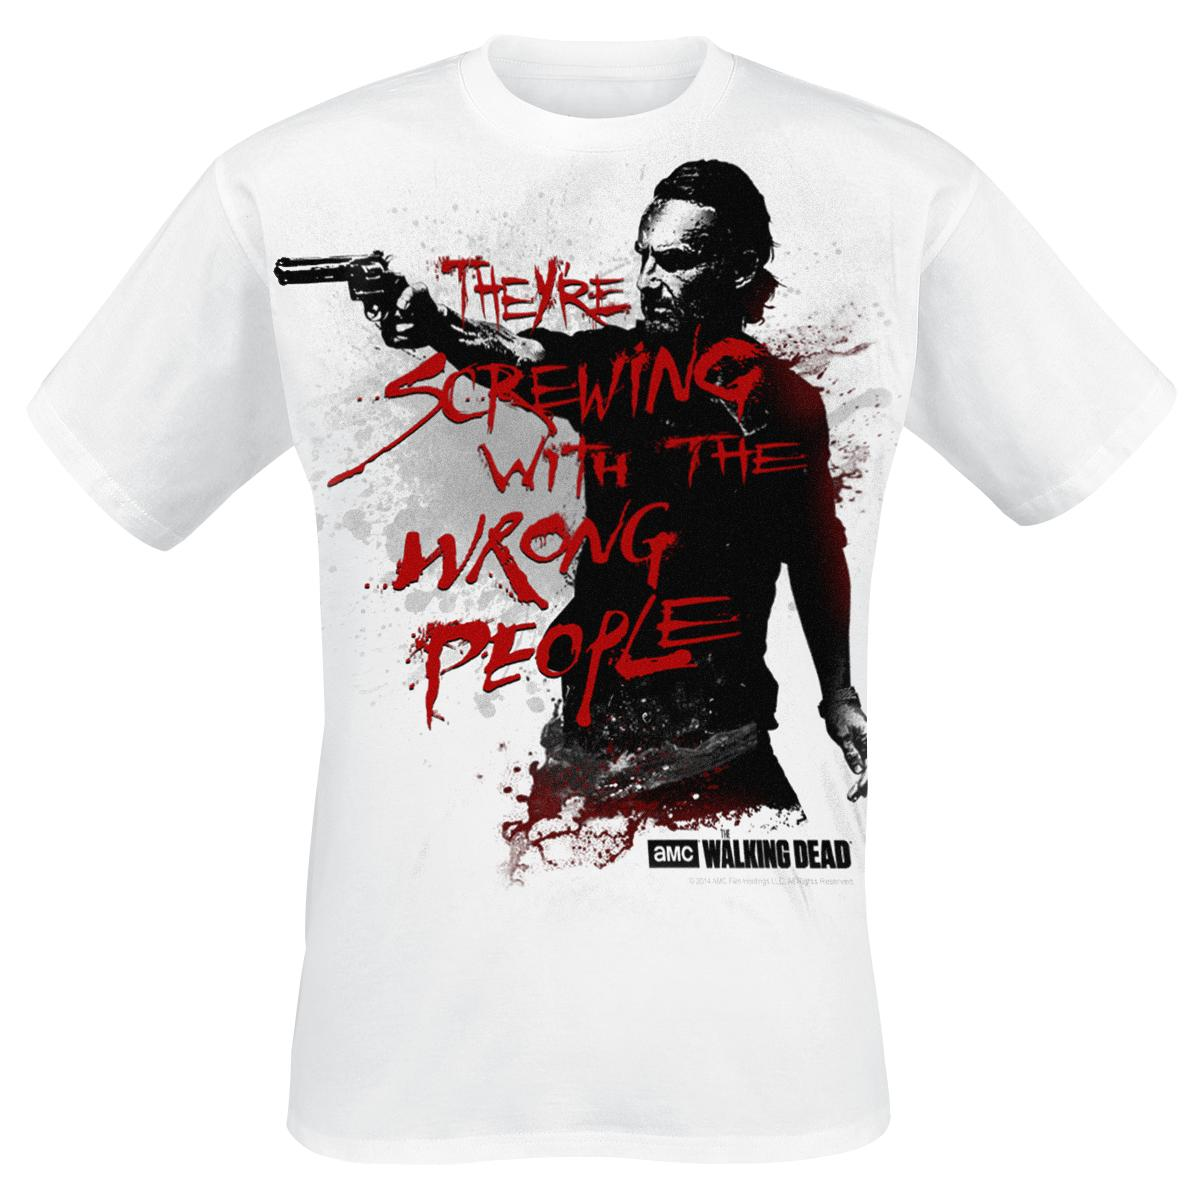 rick-grimes-wrong-people-t-shirt-design